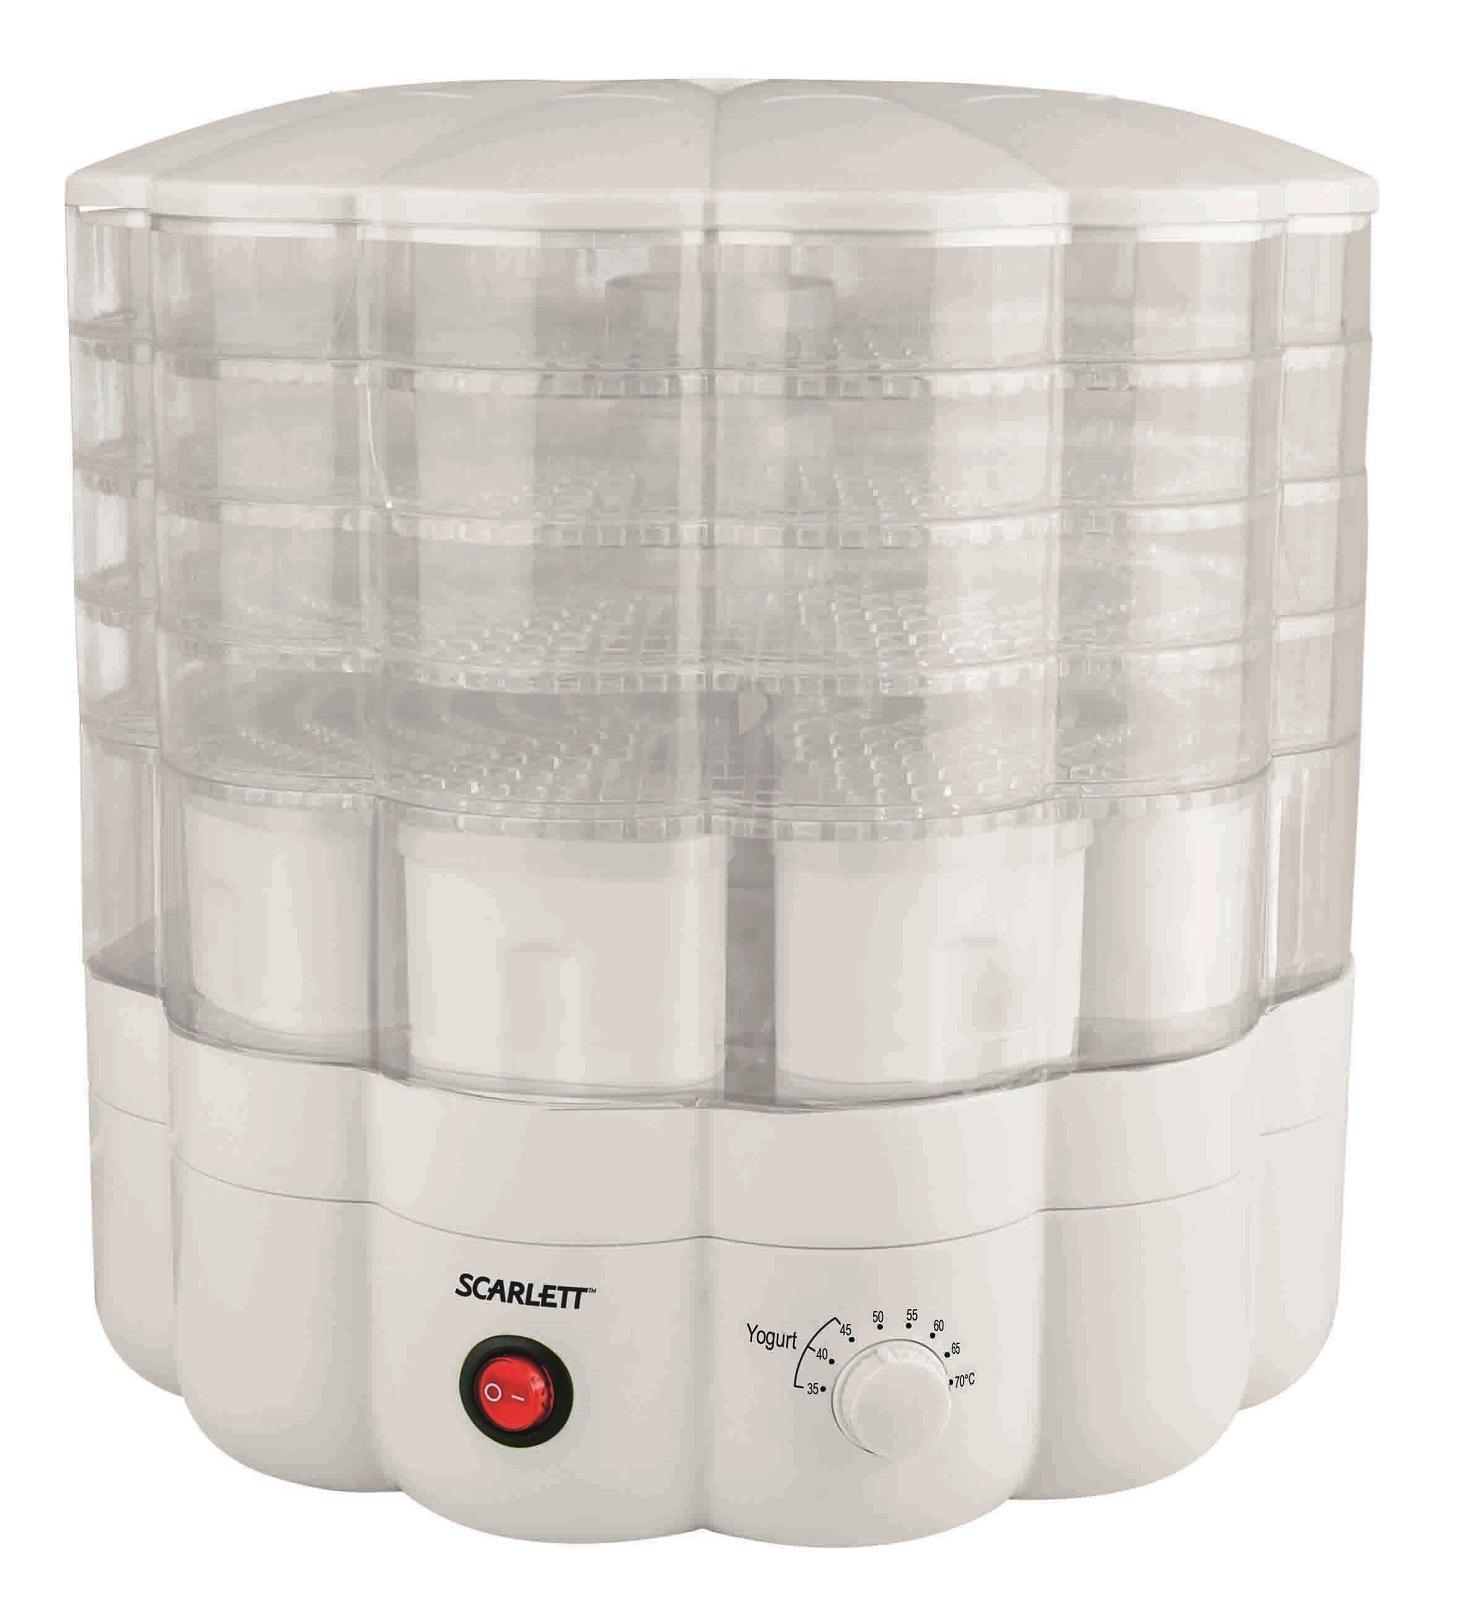 Scarlett SC-FD421001, White сушилка для продуктовSC-FD421001